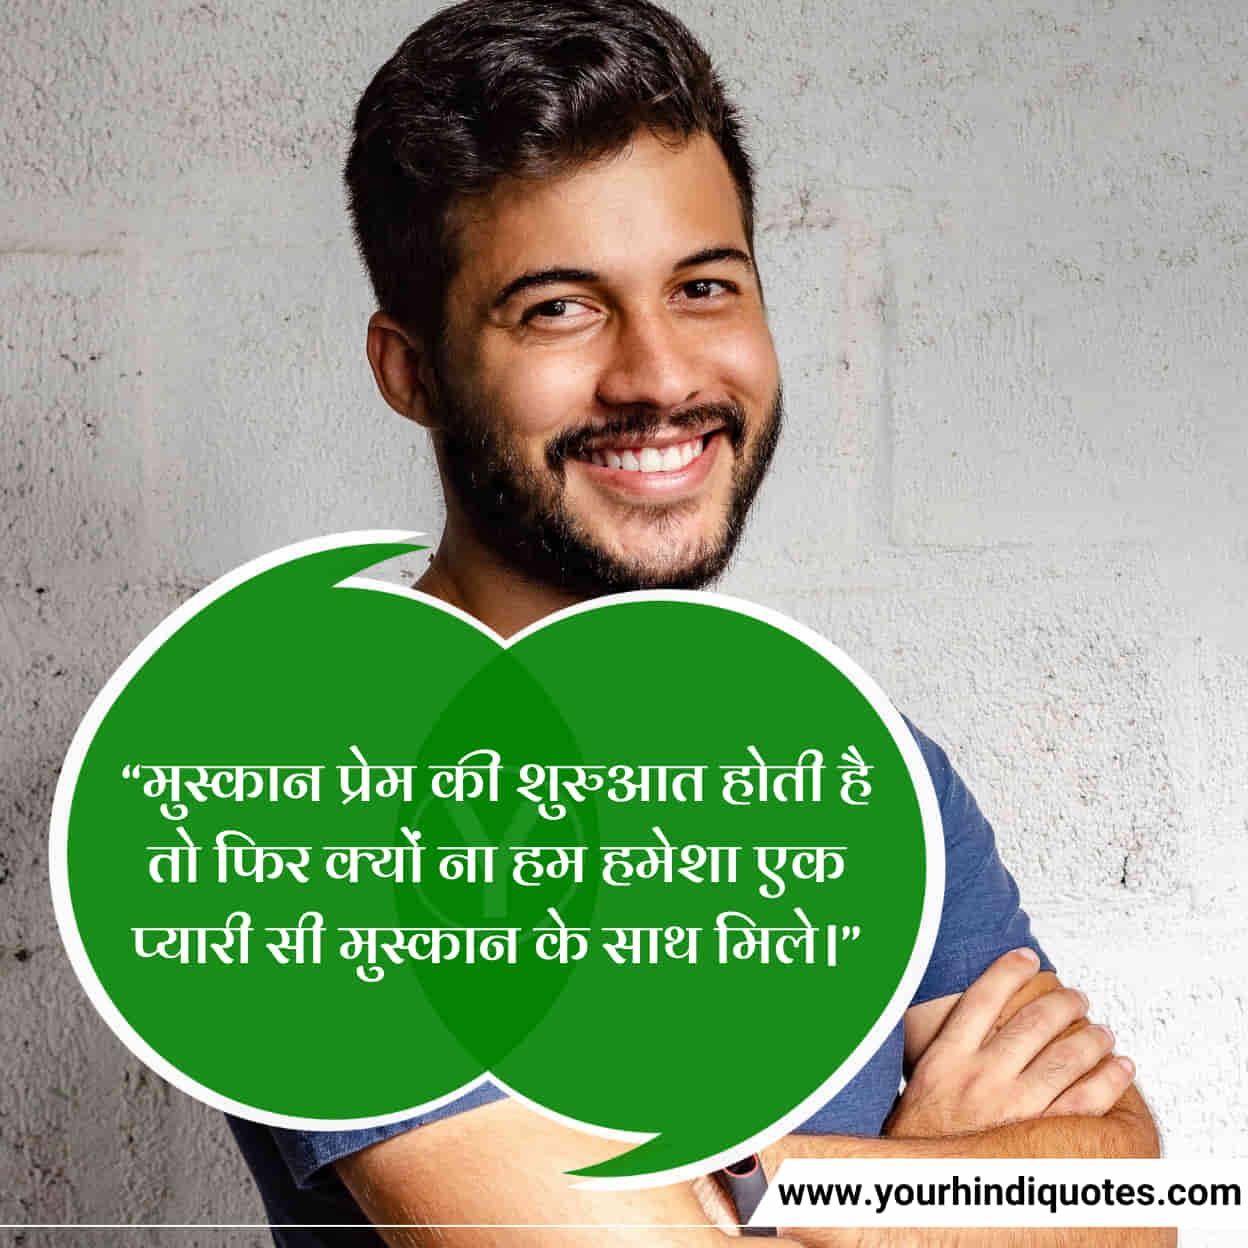 Latest Khushi Smile Quotes